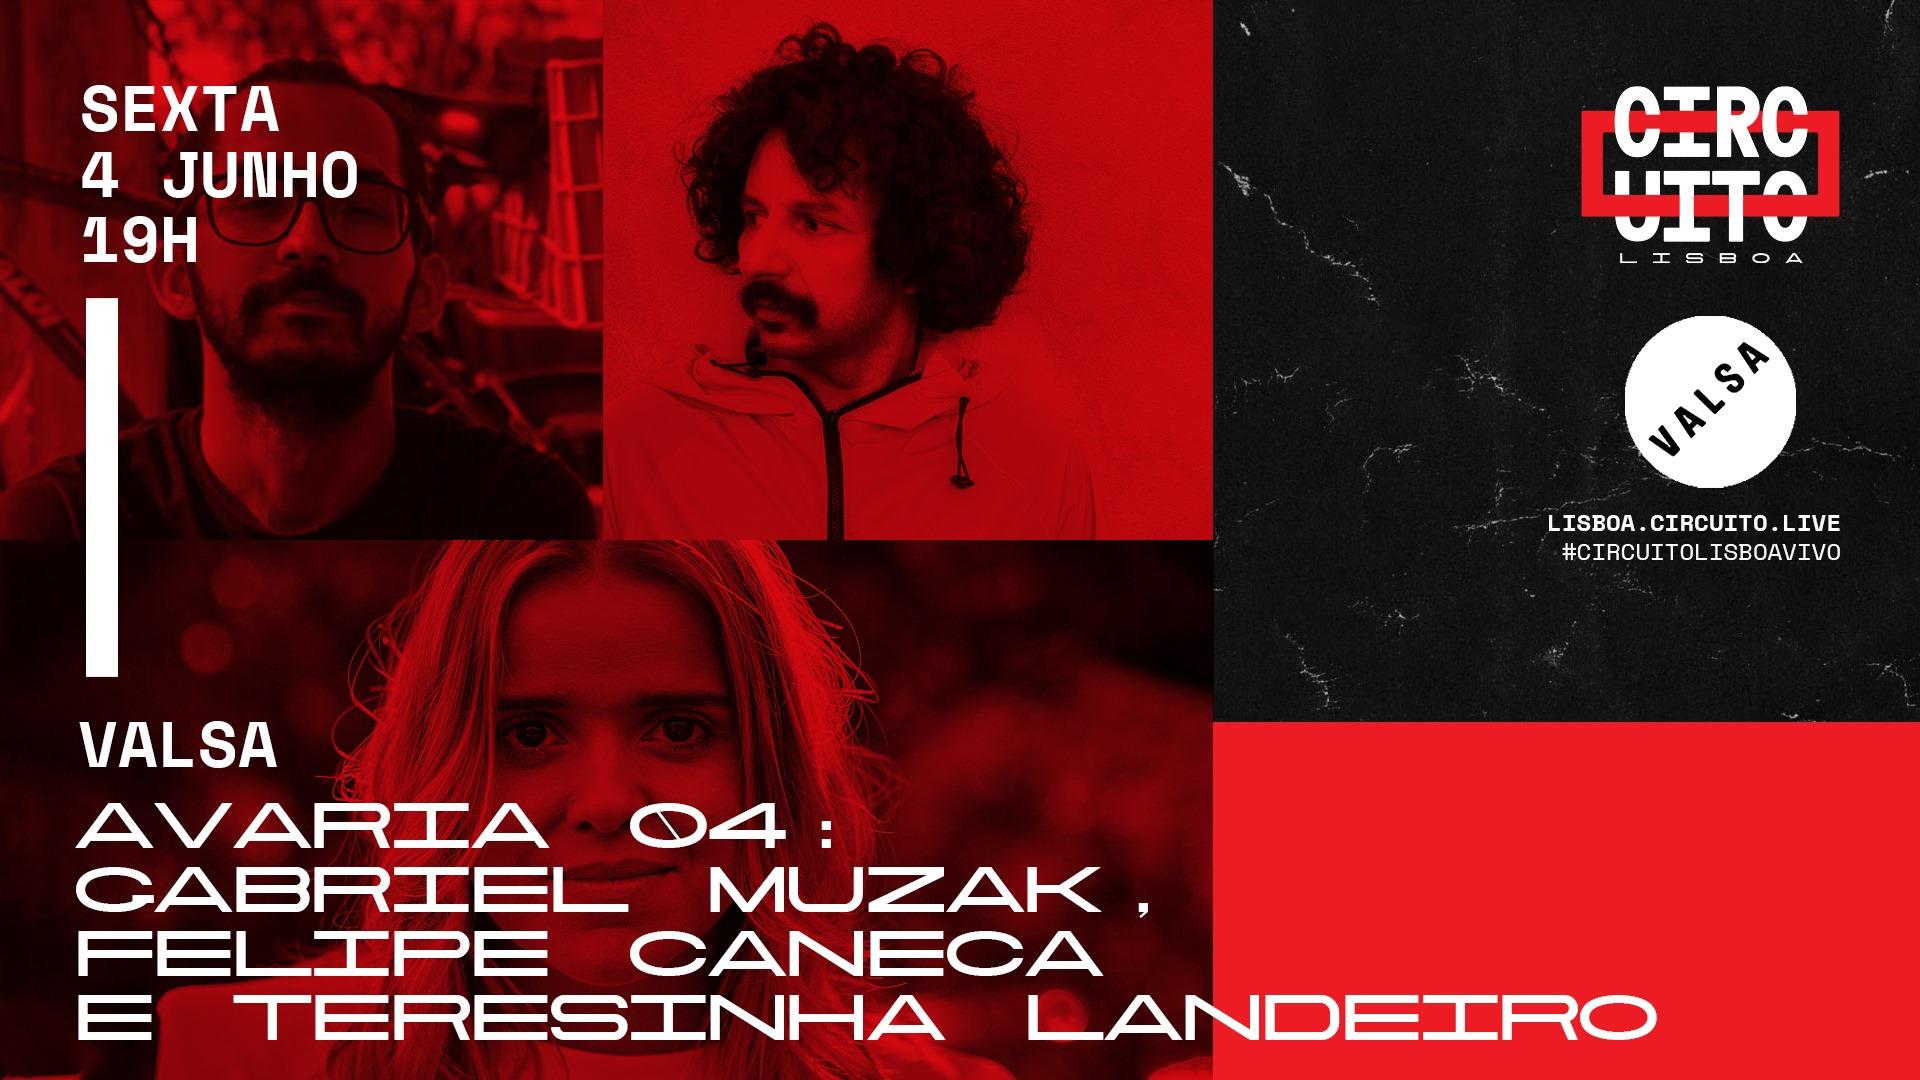 AVARIA04   GABRIEL MUZAK, FELIPE CANECA E TERESINHA LANDEIRO